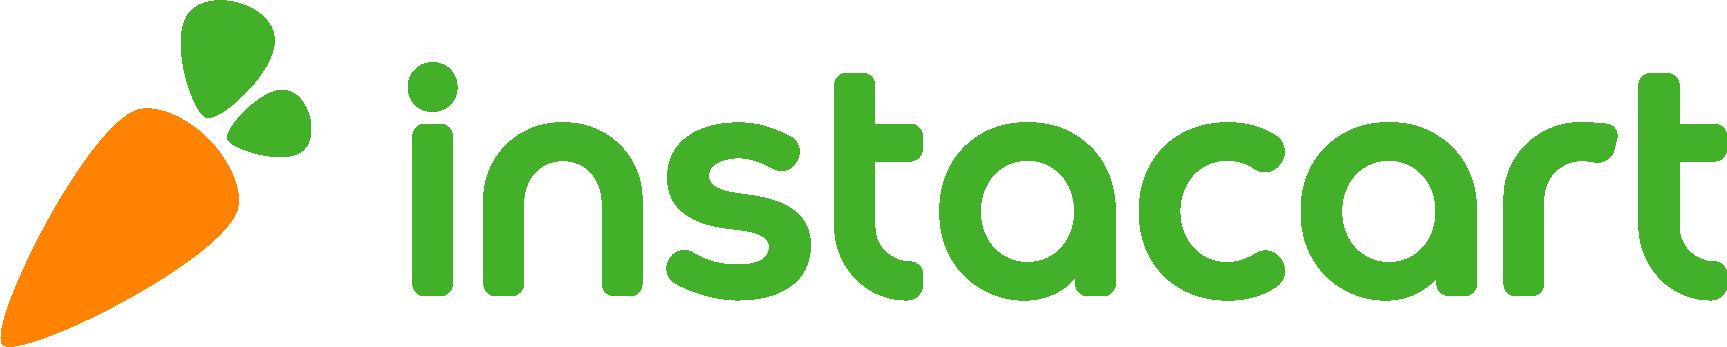 Isnatacrat logo